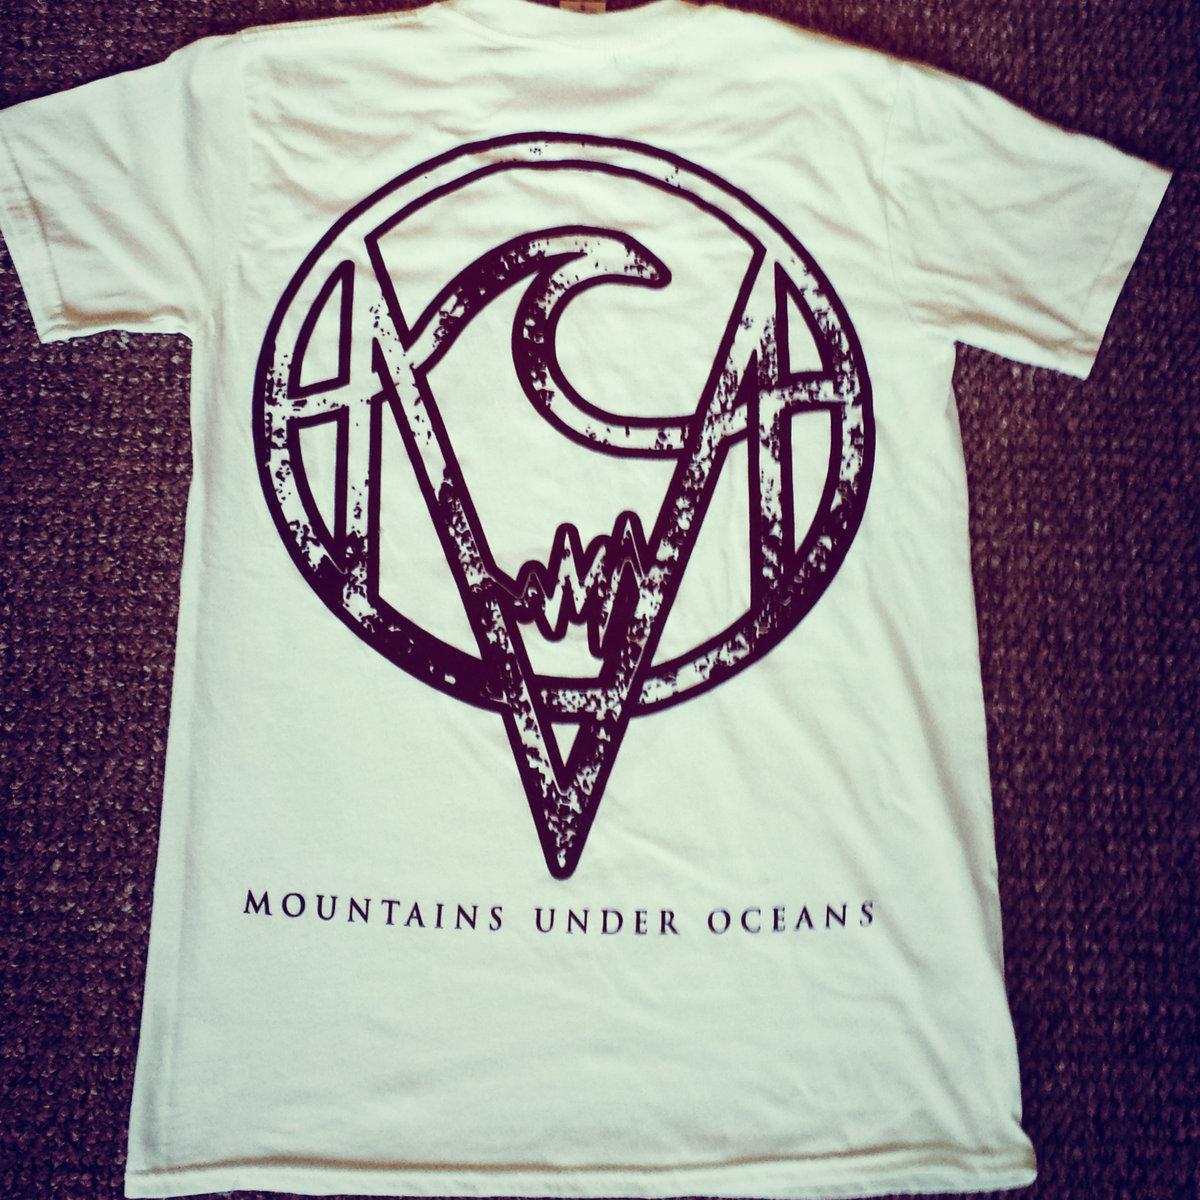 Design t shirt back - White Mountains Under Oceans T Shirt Black Ink Pocket And Full Back Design